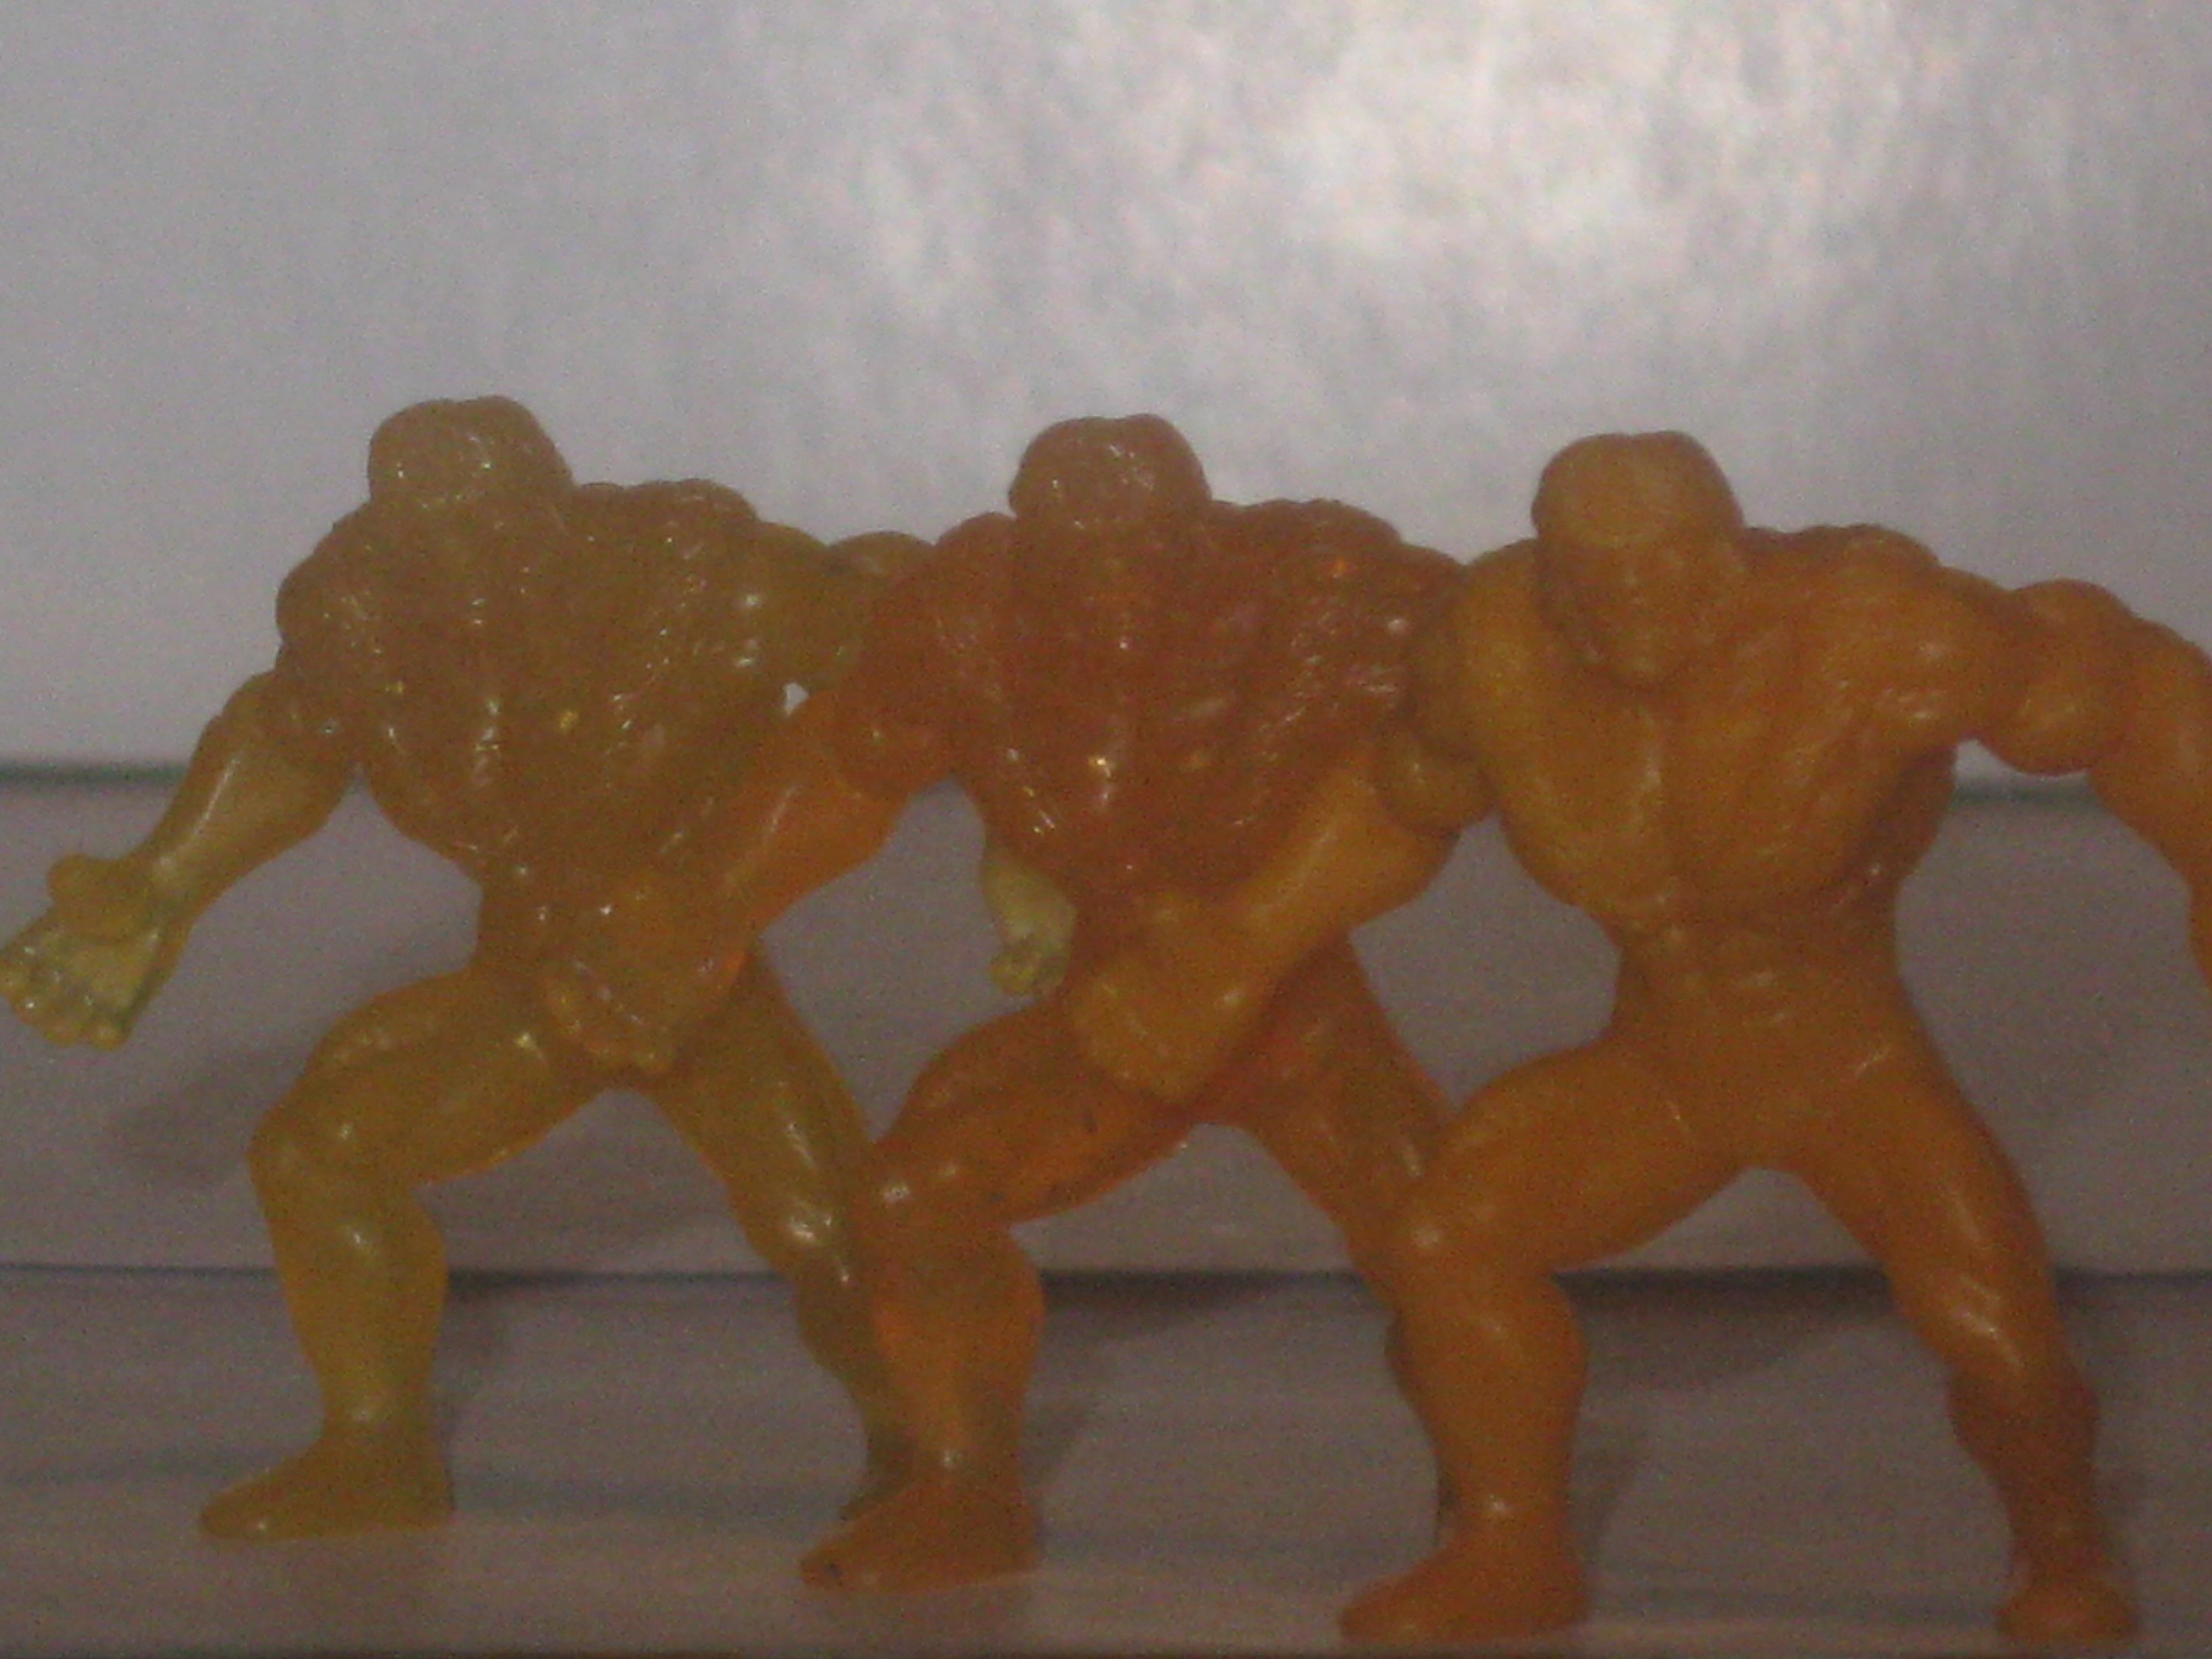 Hasbro Marvel Handful of Heroes Wave 1 Ufoes X-Ray Solid Dark Red